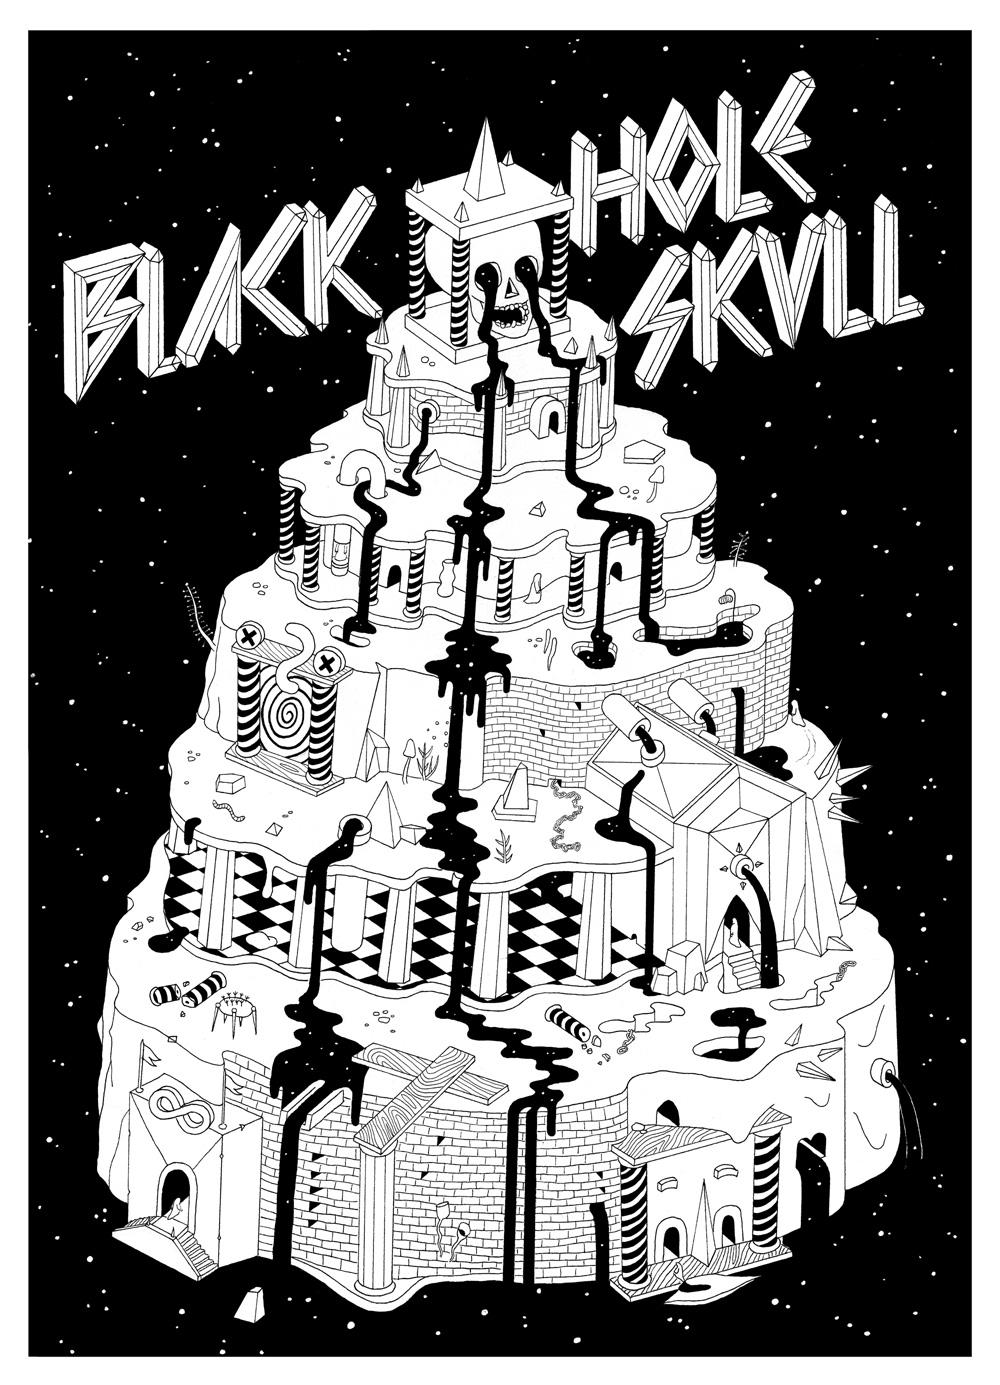 blackholeskull_final_low